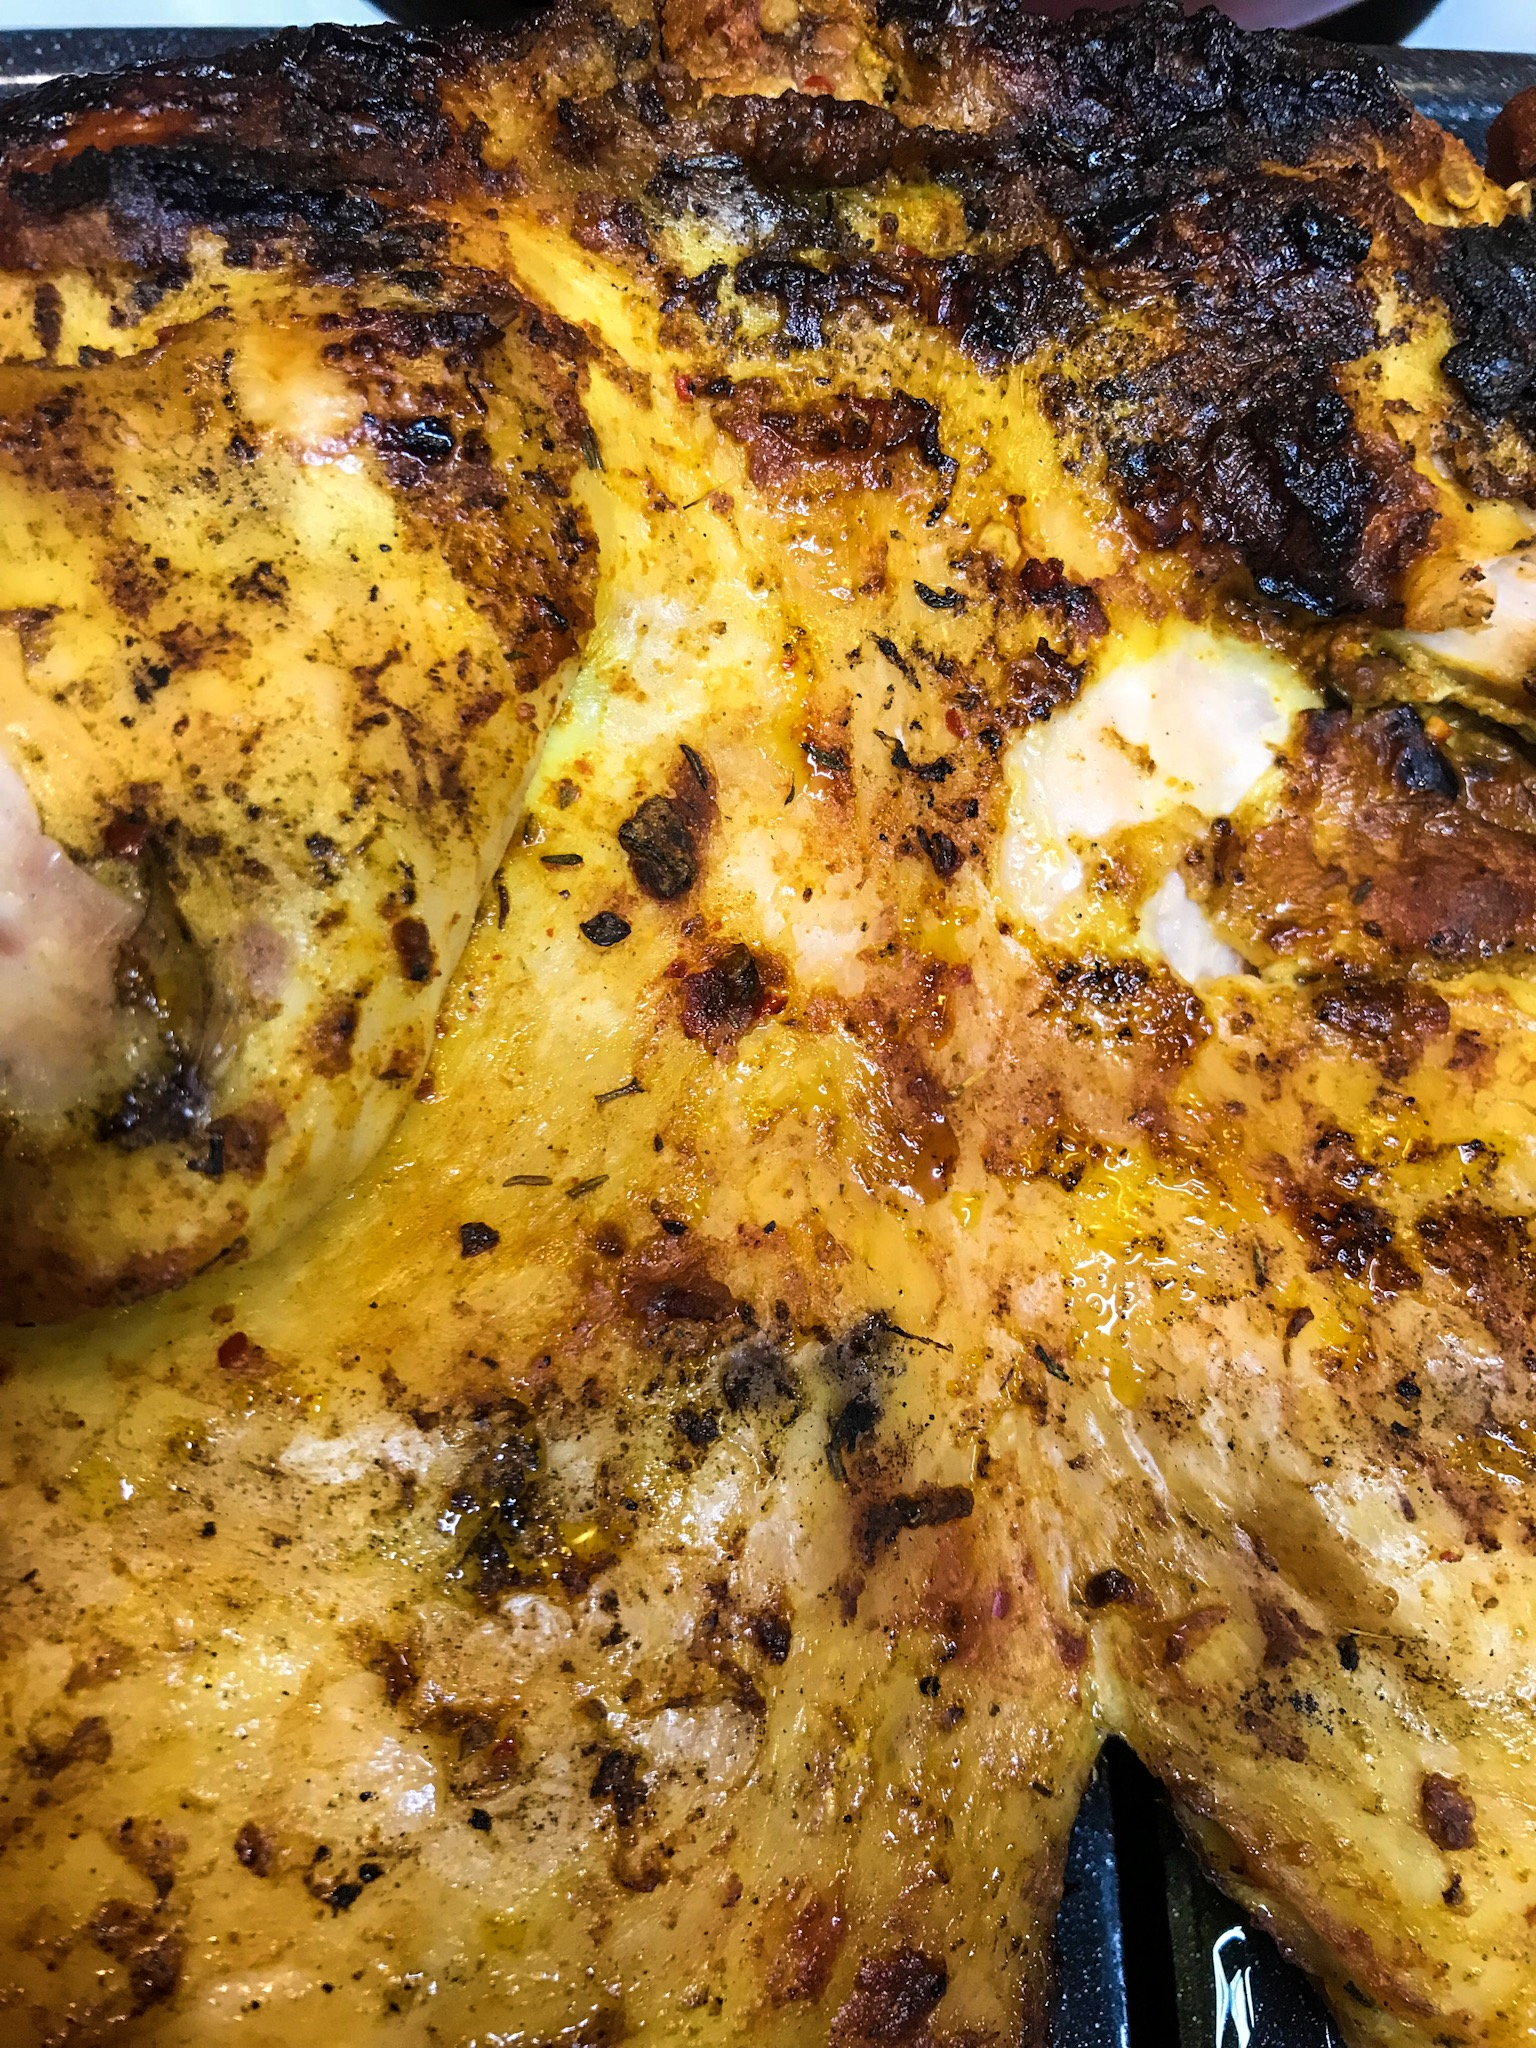 Applewood smoked chicken